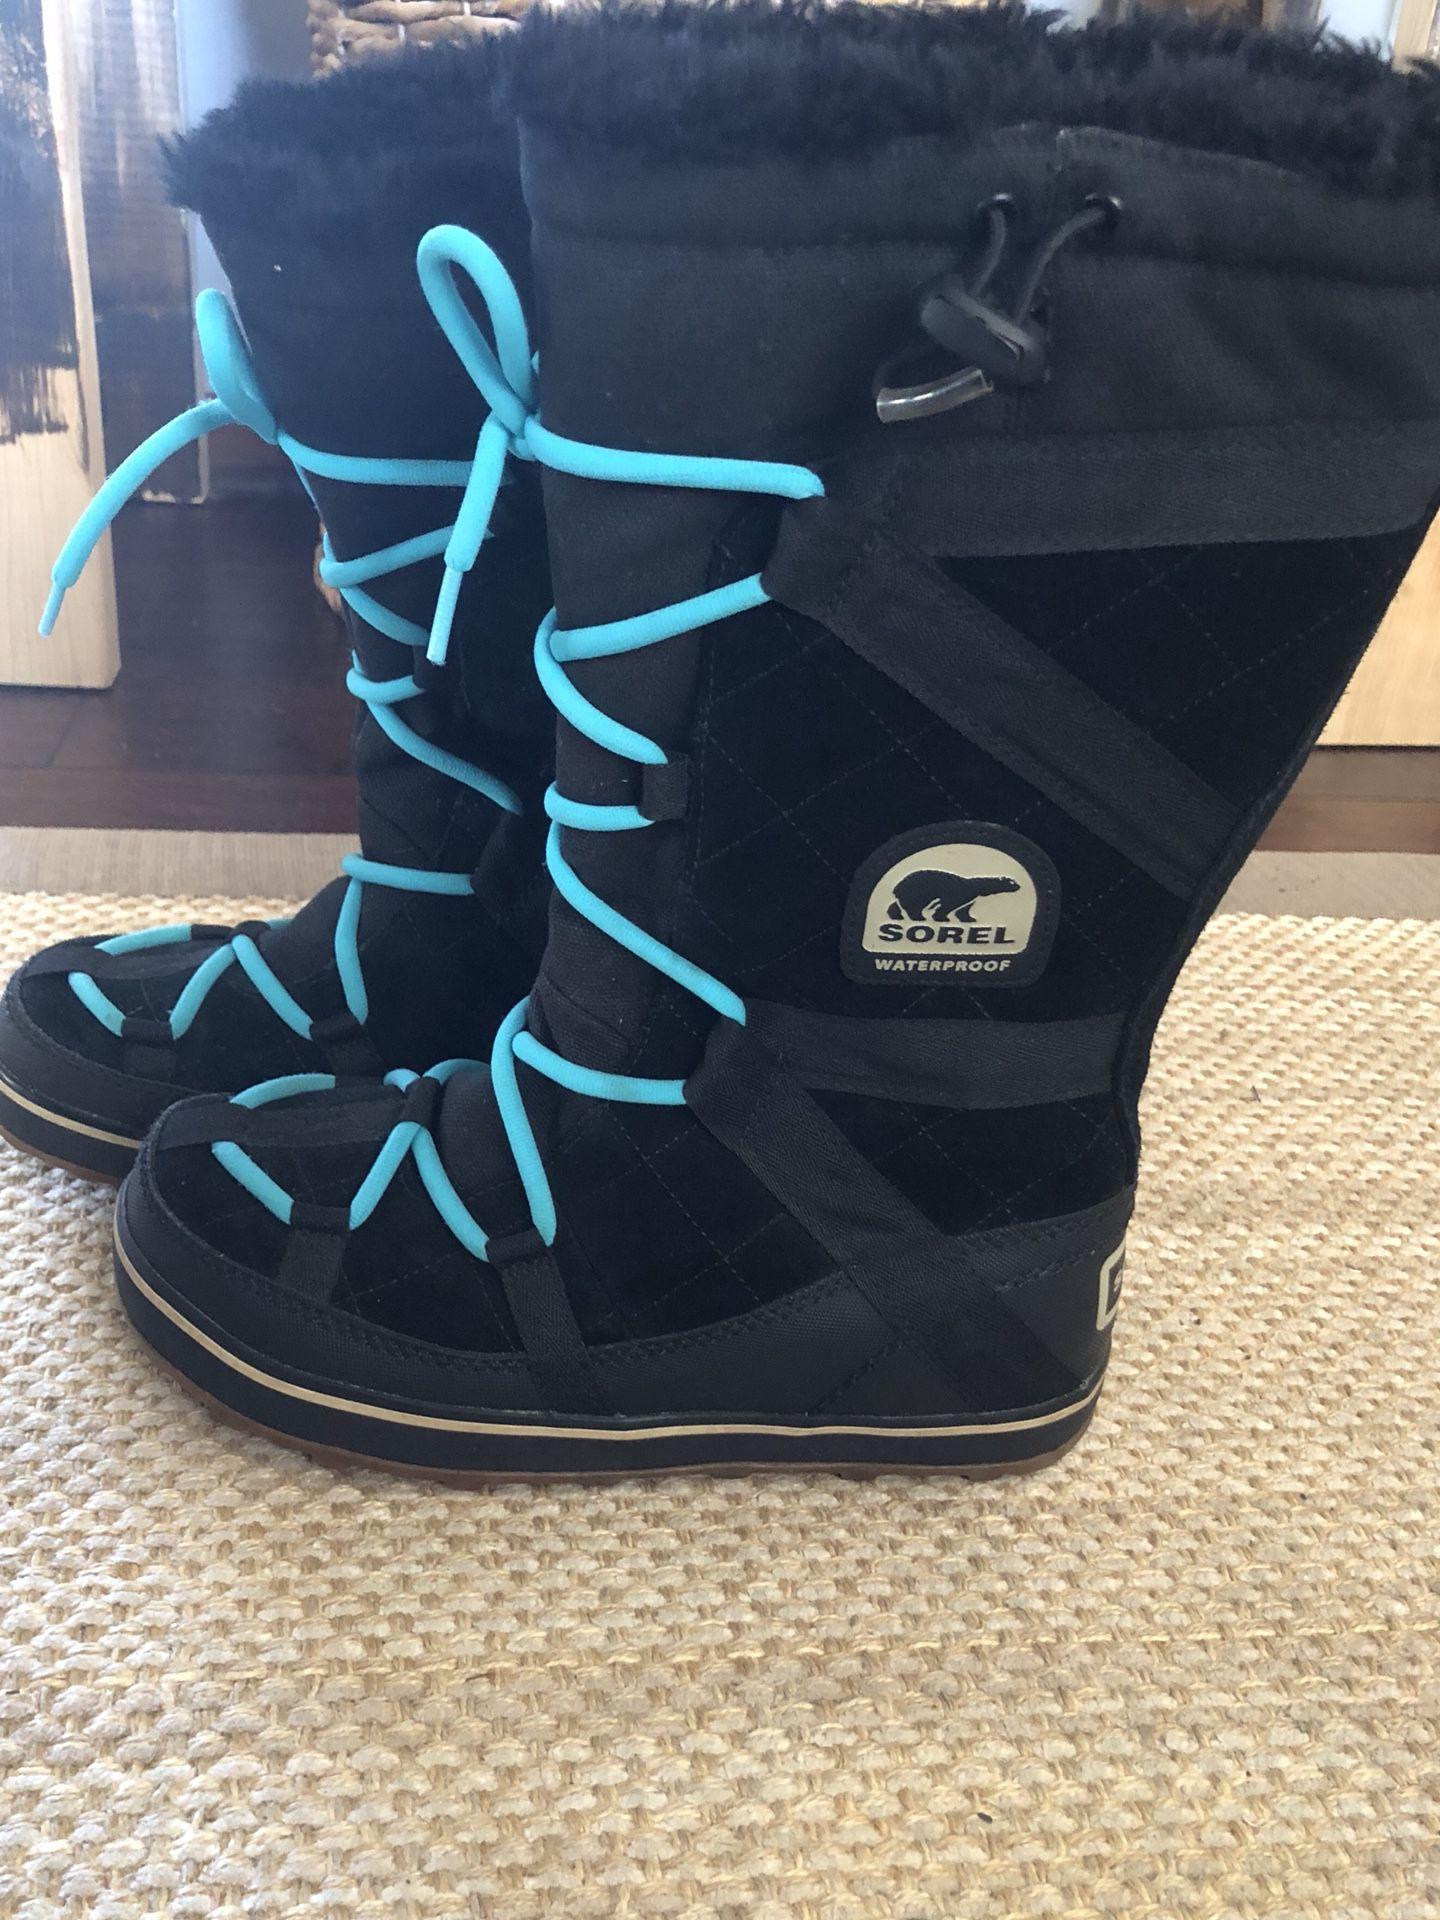 Sorel Glacy Explorer Black winter boots. Size 8. Originally $135